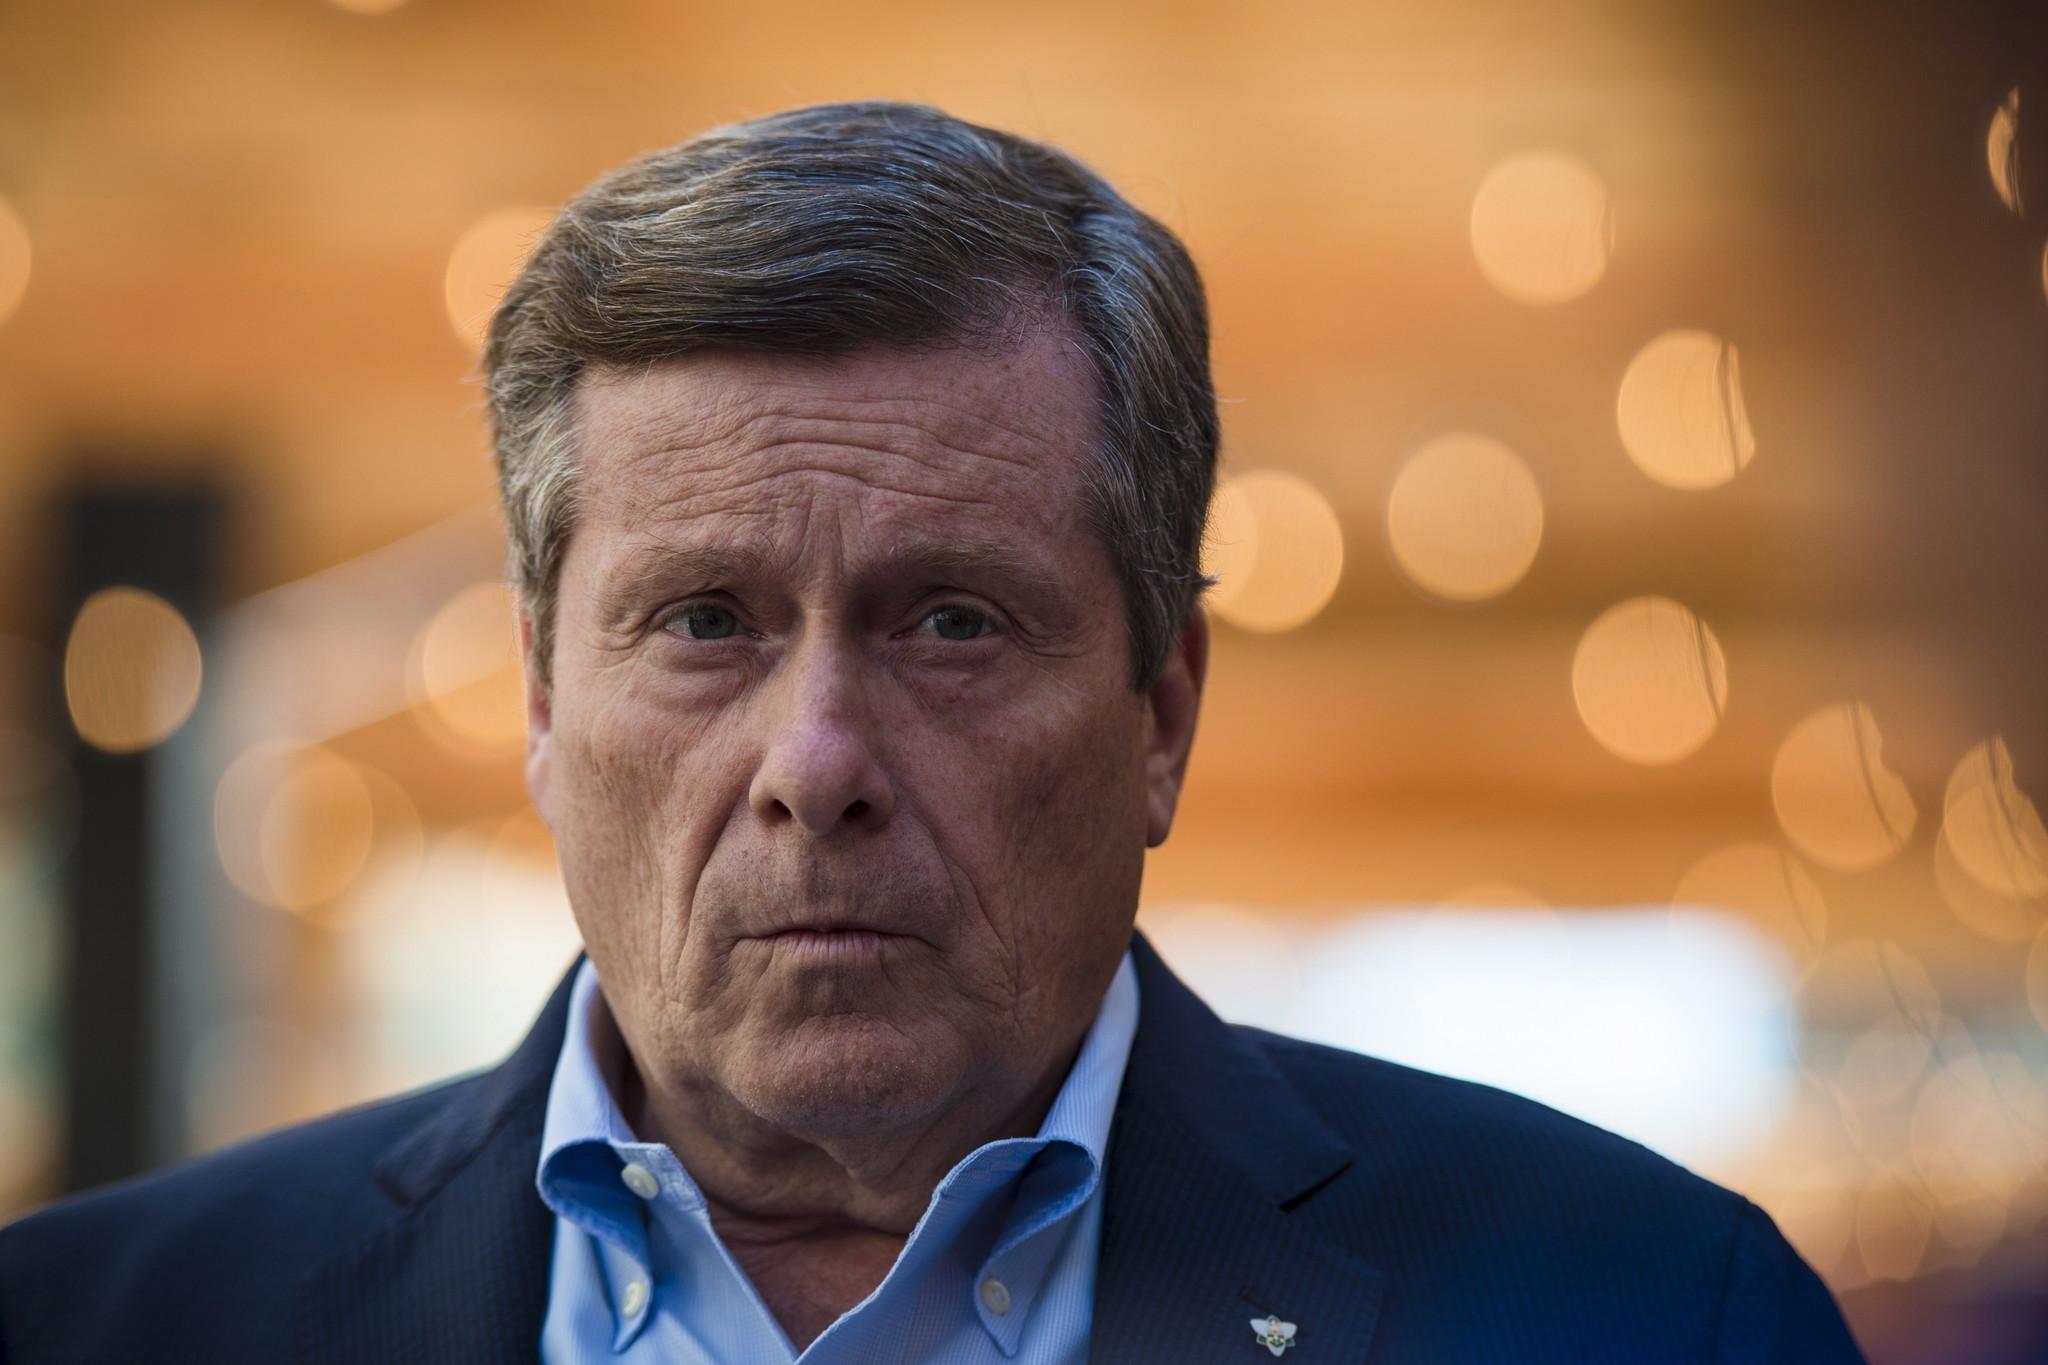 Toronto mayor takes stand against anti-Chinese discrimination amid coronavirus fears